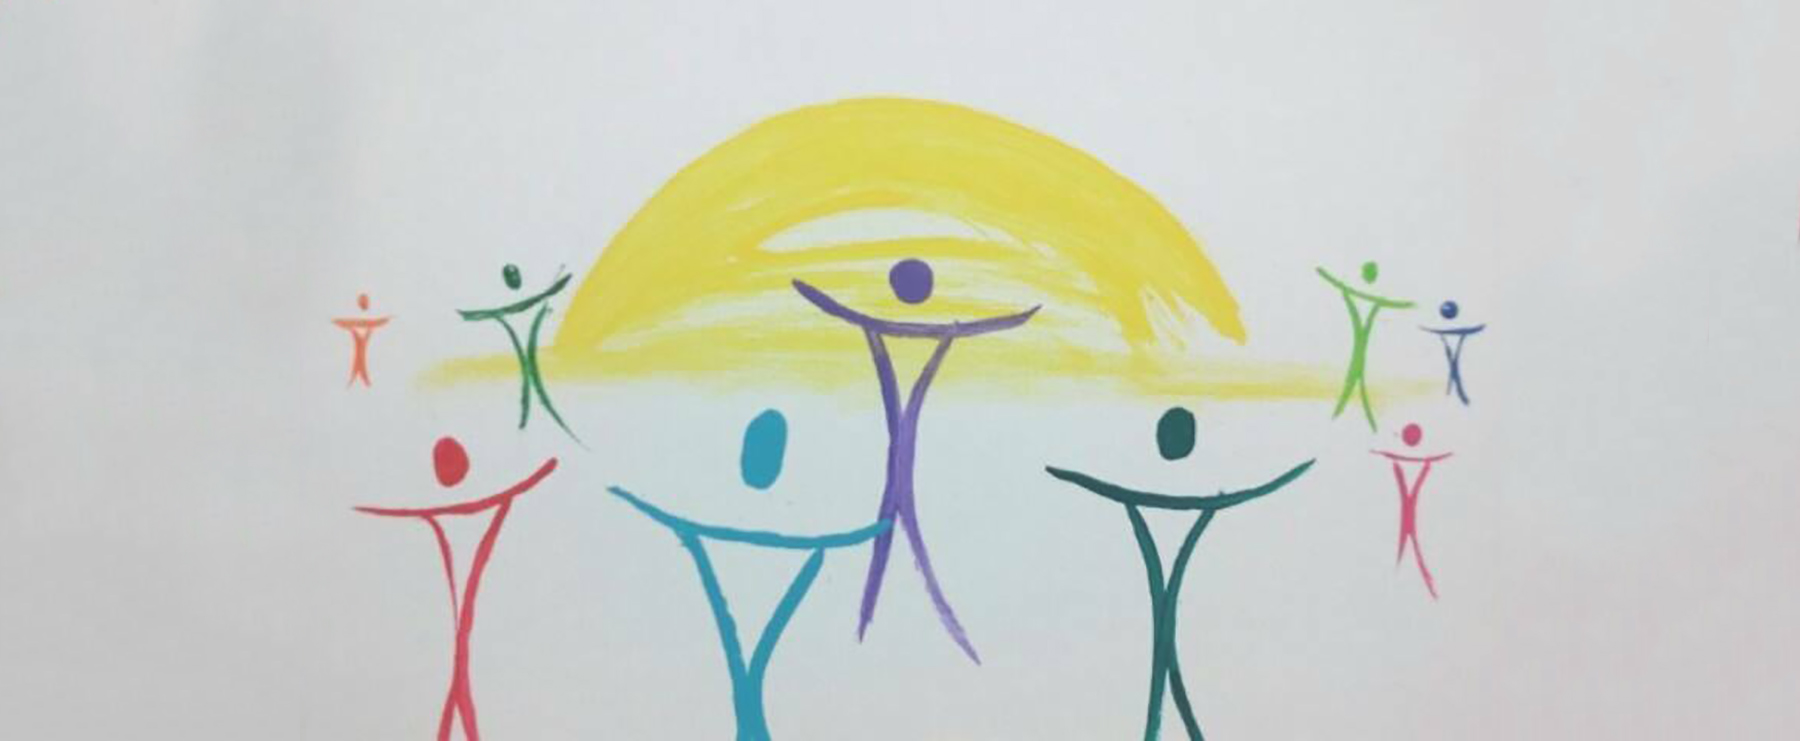 sun-dancers-cropped